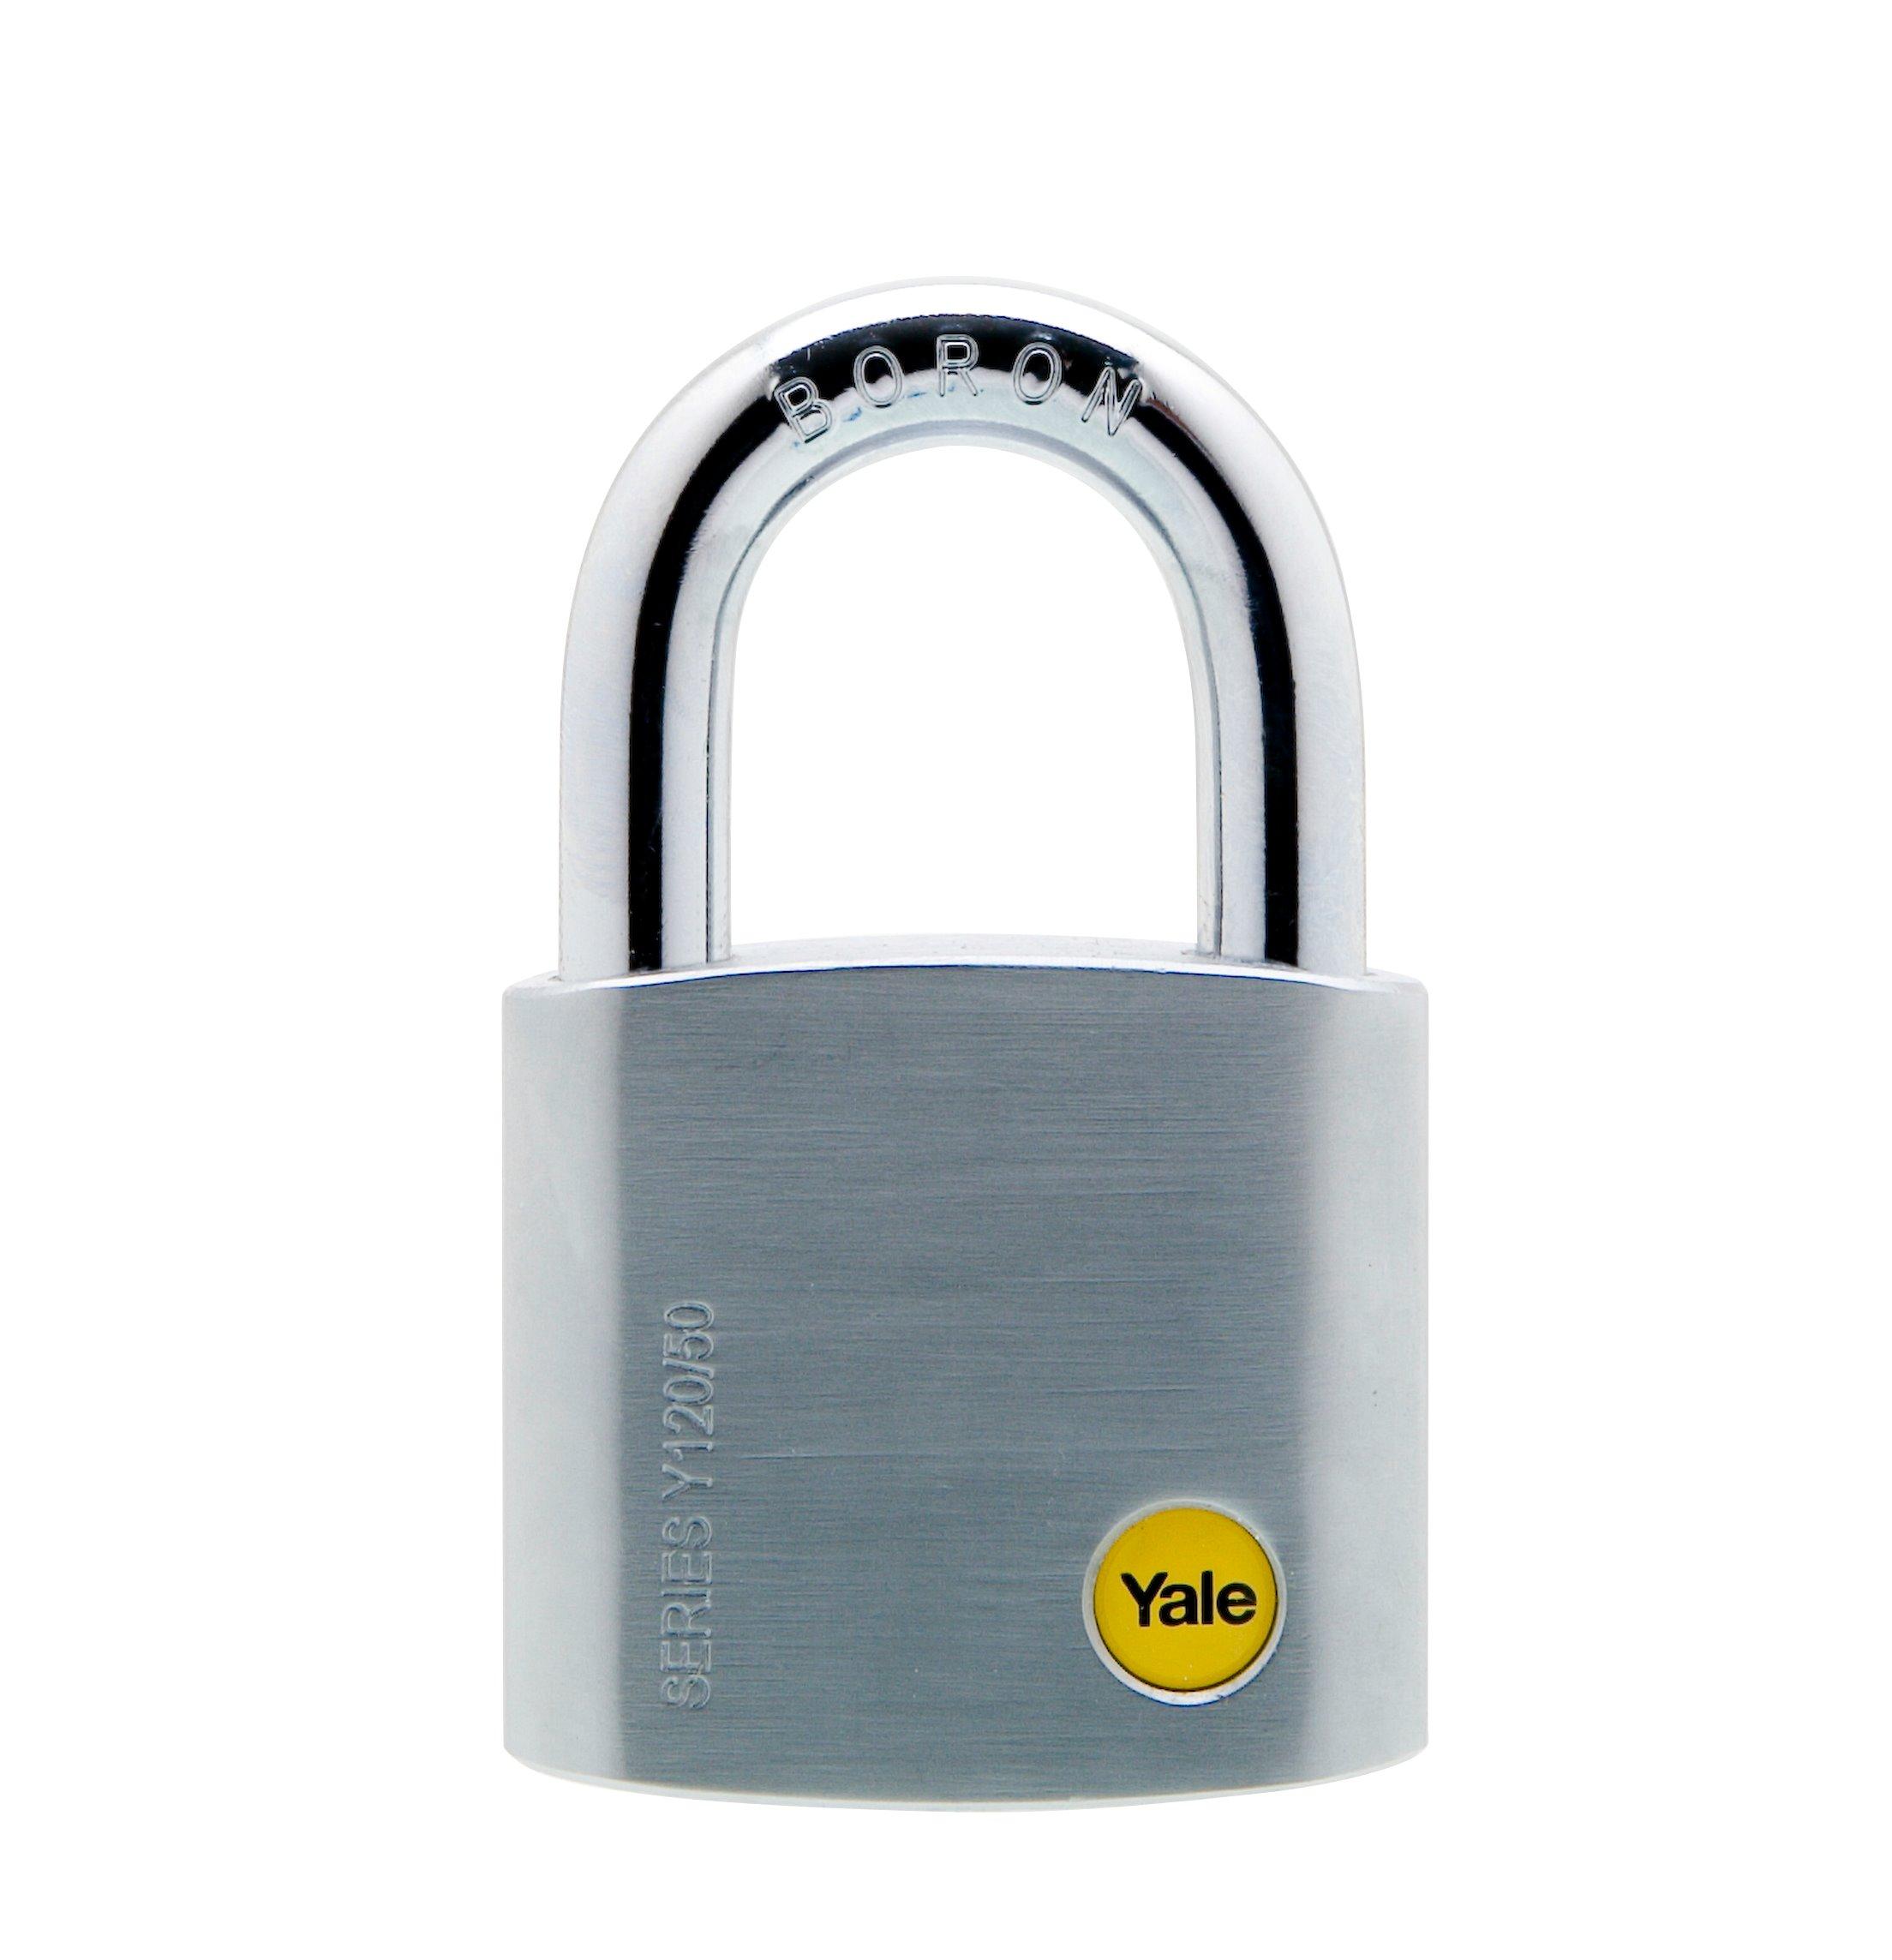 Y210 Open Shackle High Security Steel Padlock High